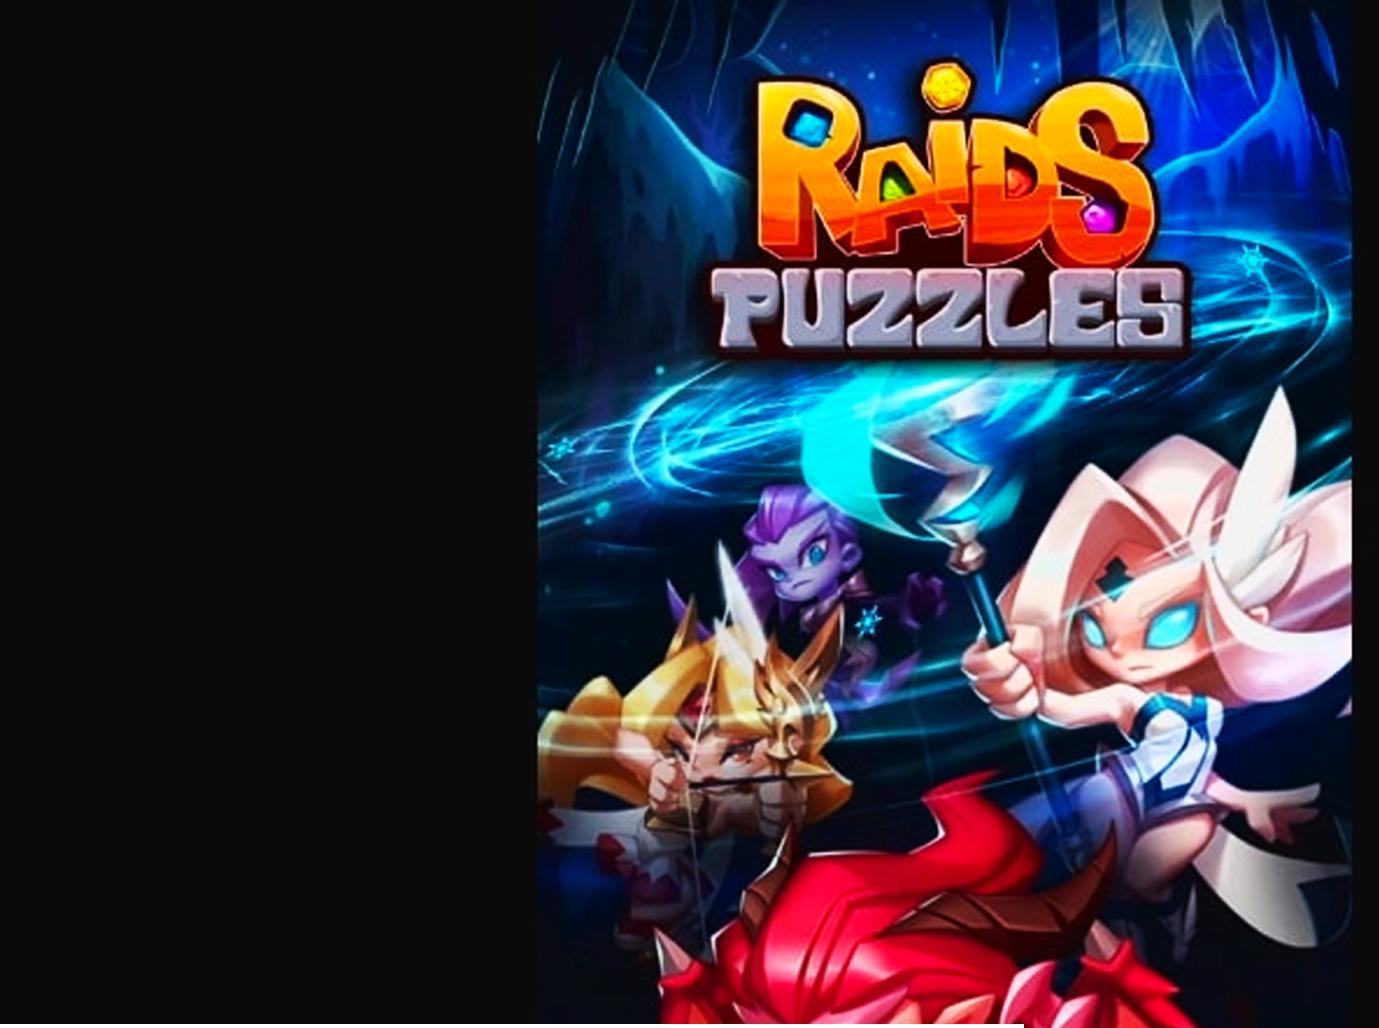 Gioca Raids & Puzzles: RPG Quest sul tuo PC